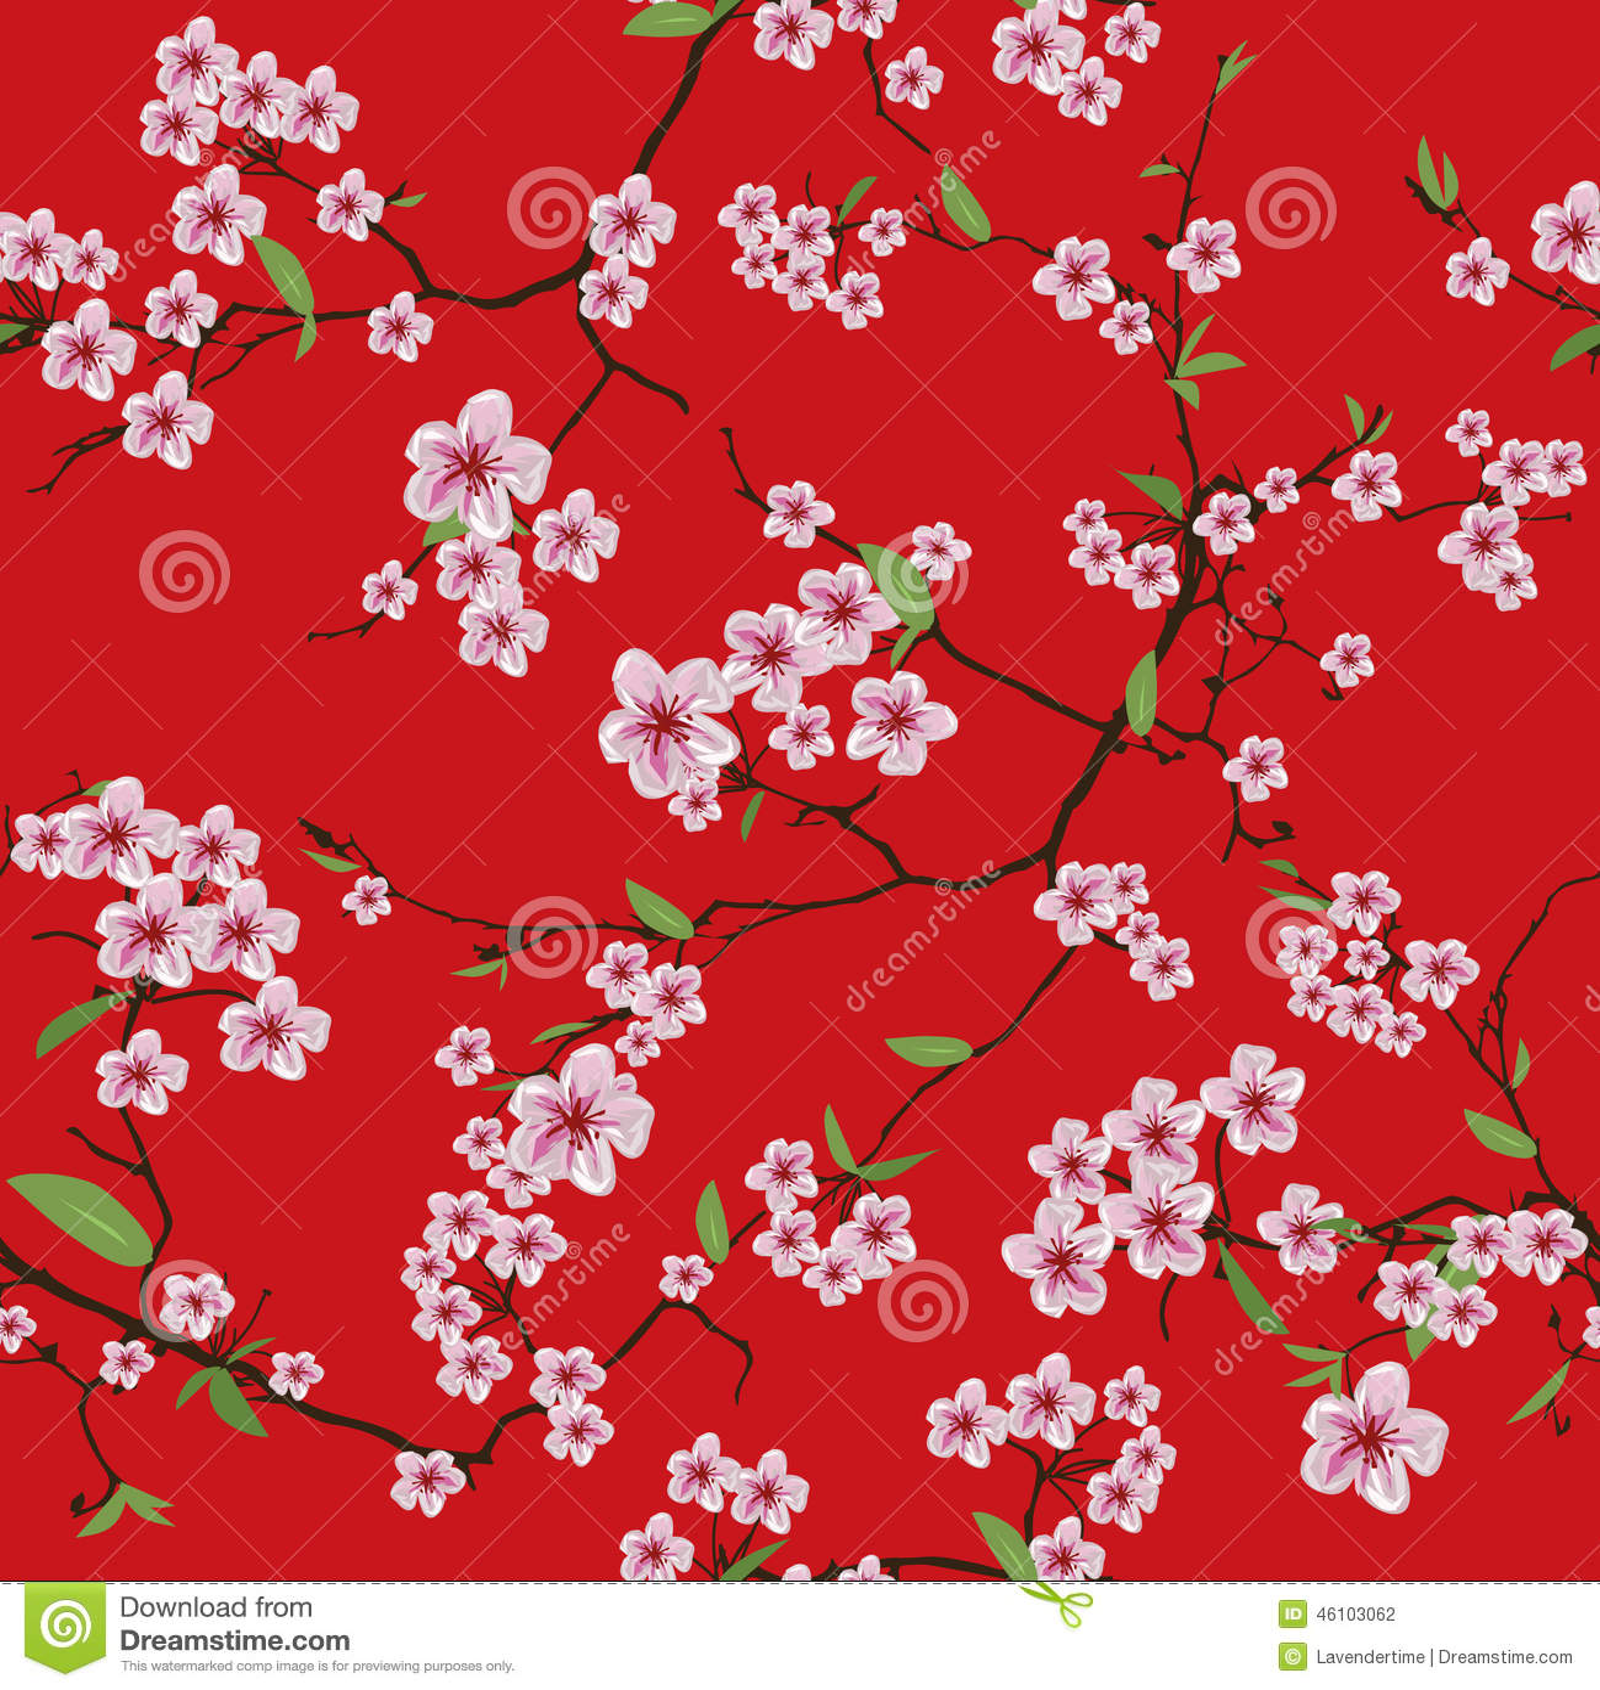 Nature background with blossoming sakura branch royalty free stock - Chinese Sakura Red Kimono Seamless Vector Pattern Stock